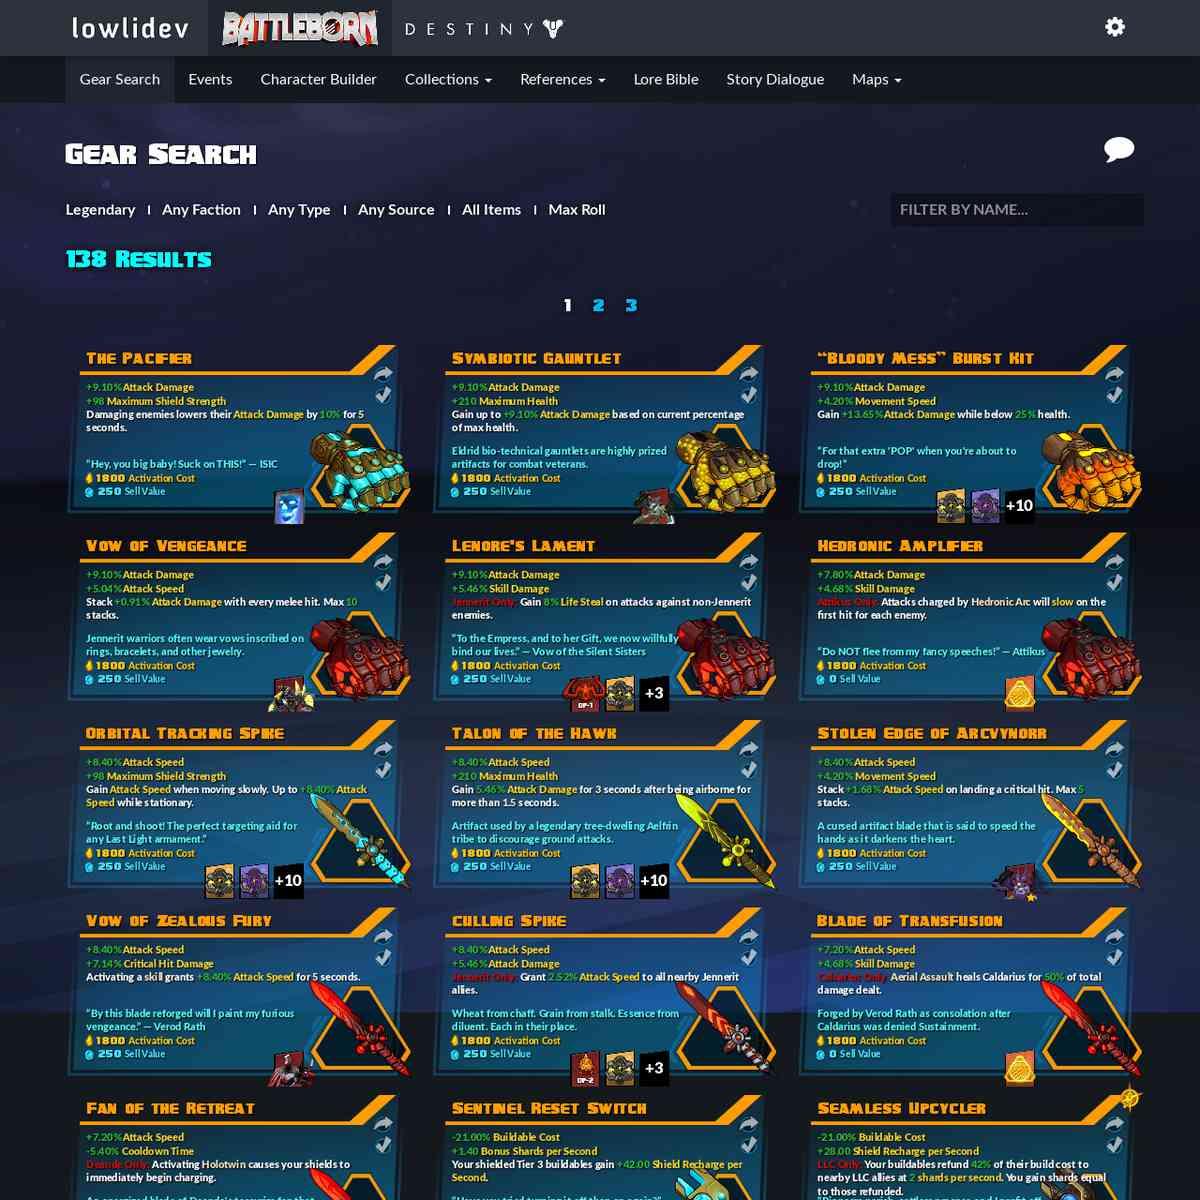 Gear Search - Battleborn | lowlidev